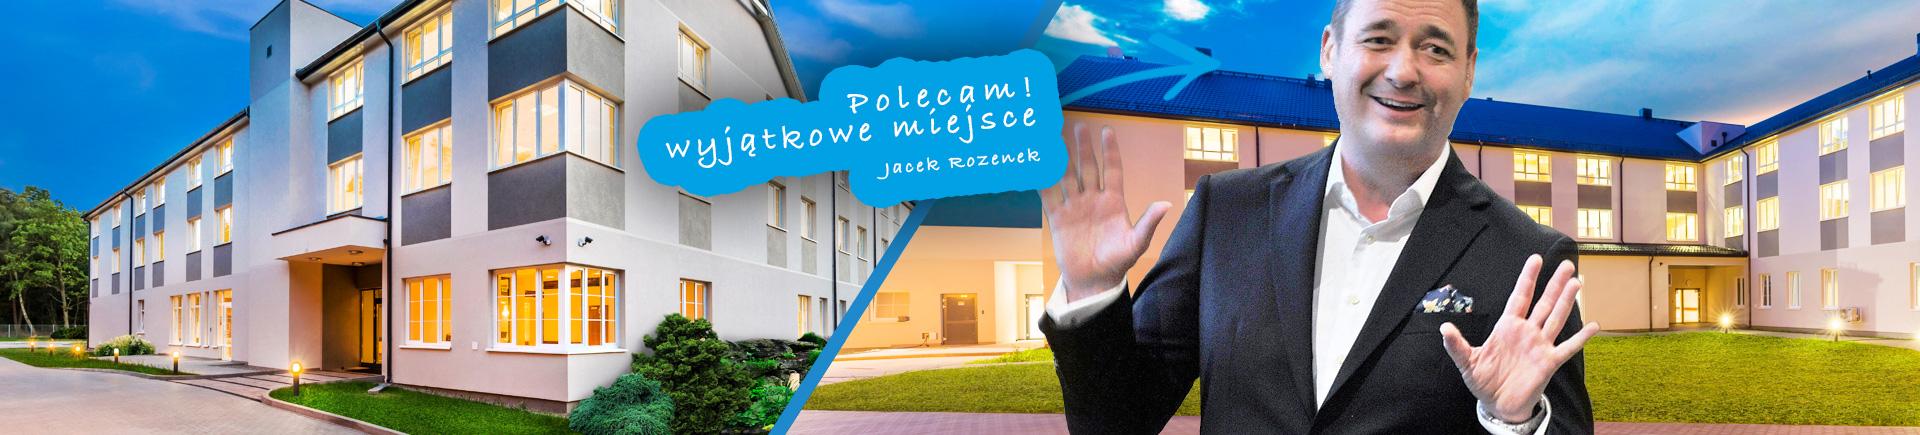 Leśna Polana – Maciej Rozenek – Polecam!